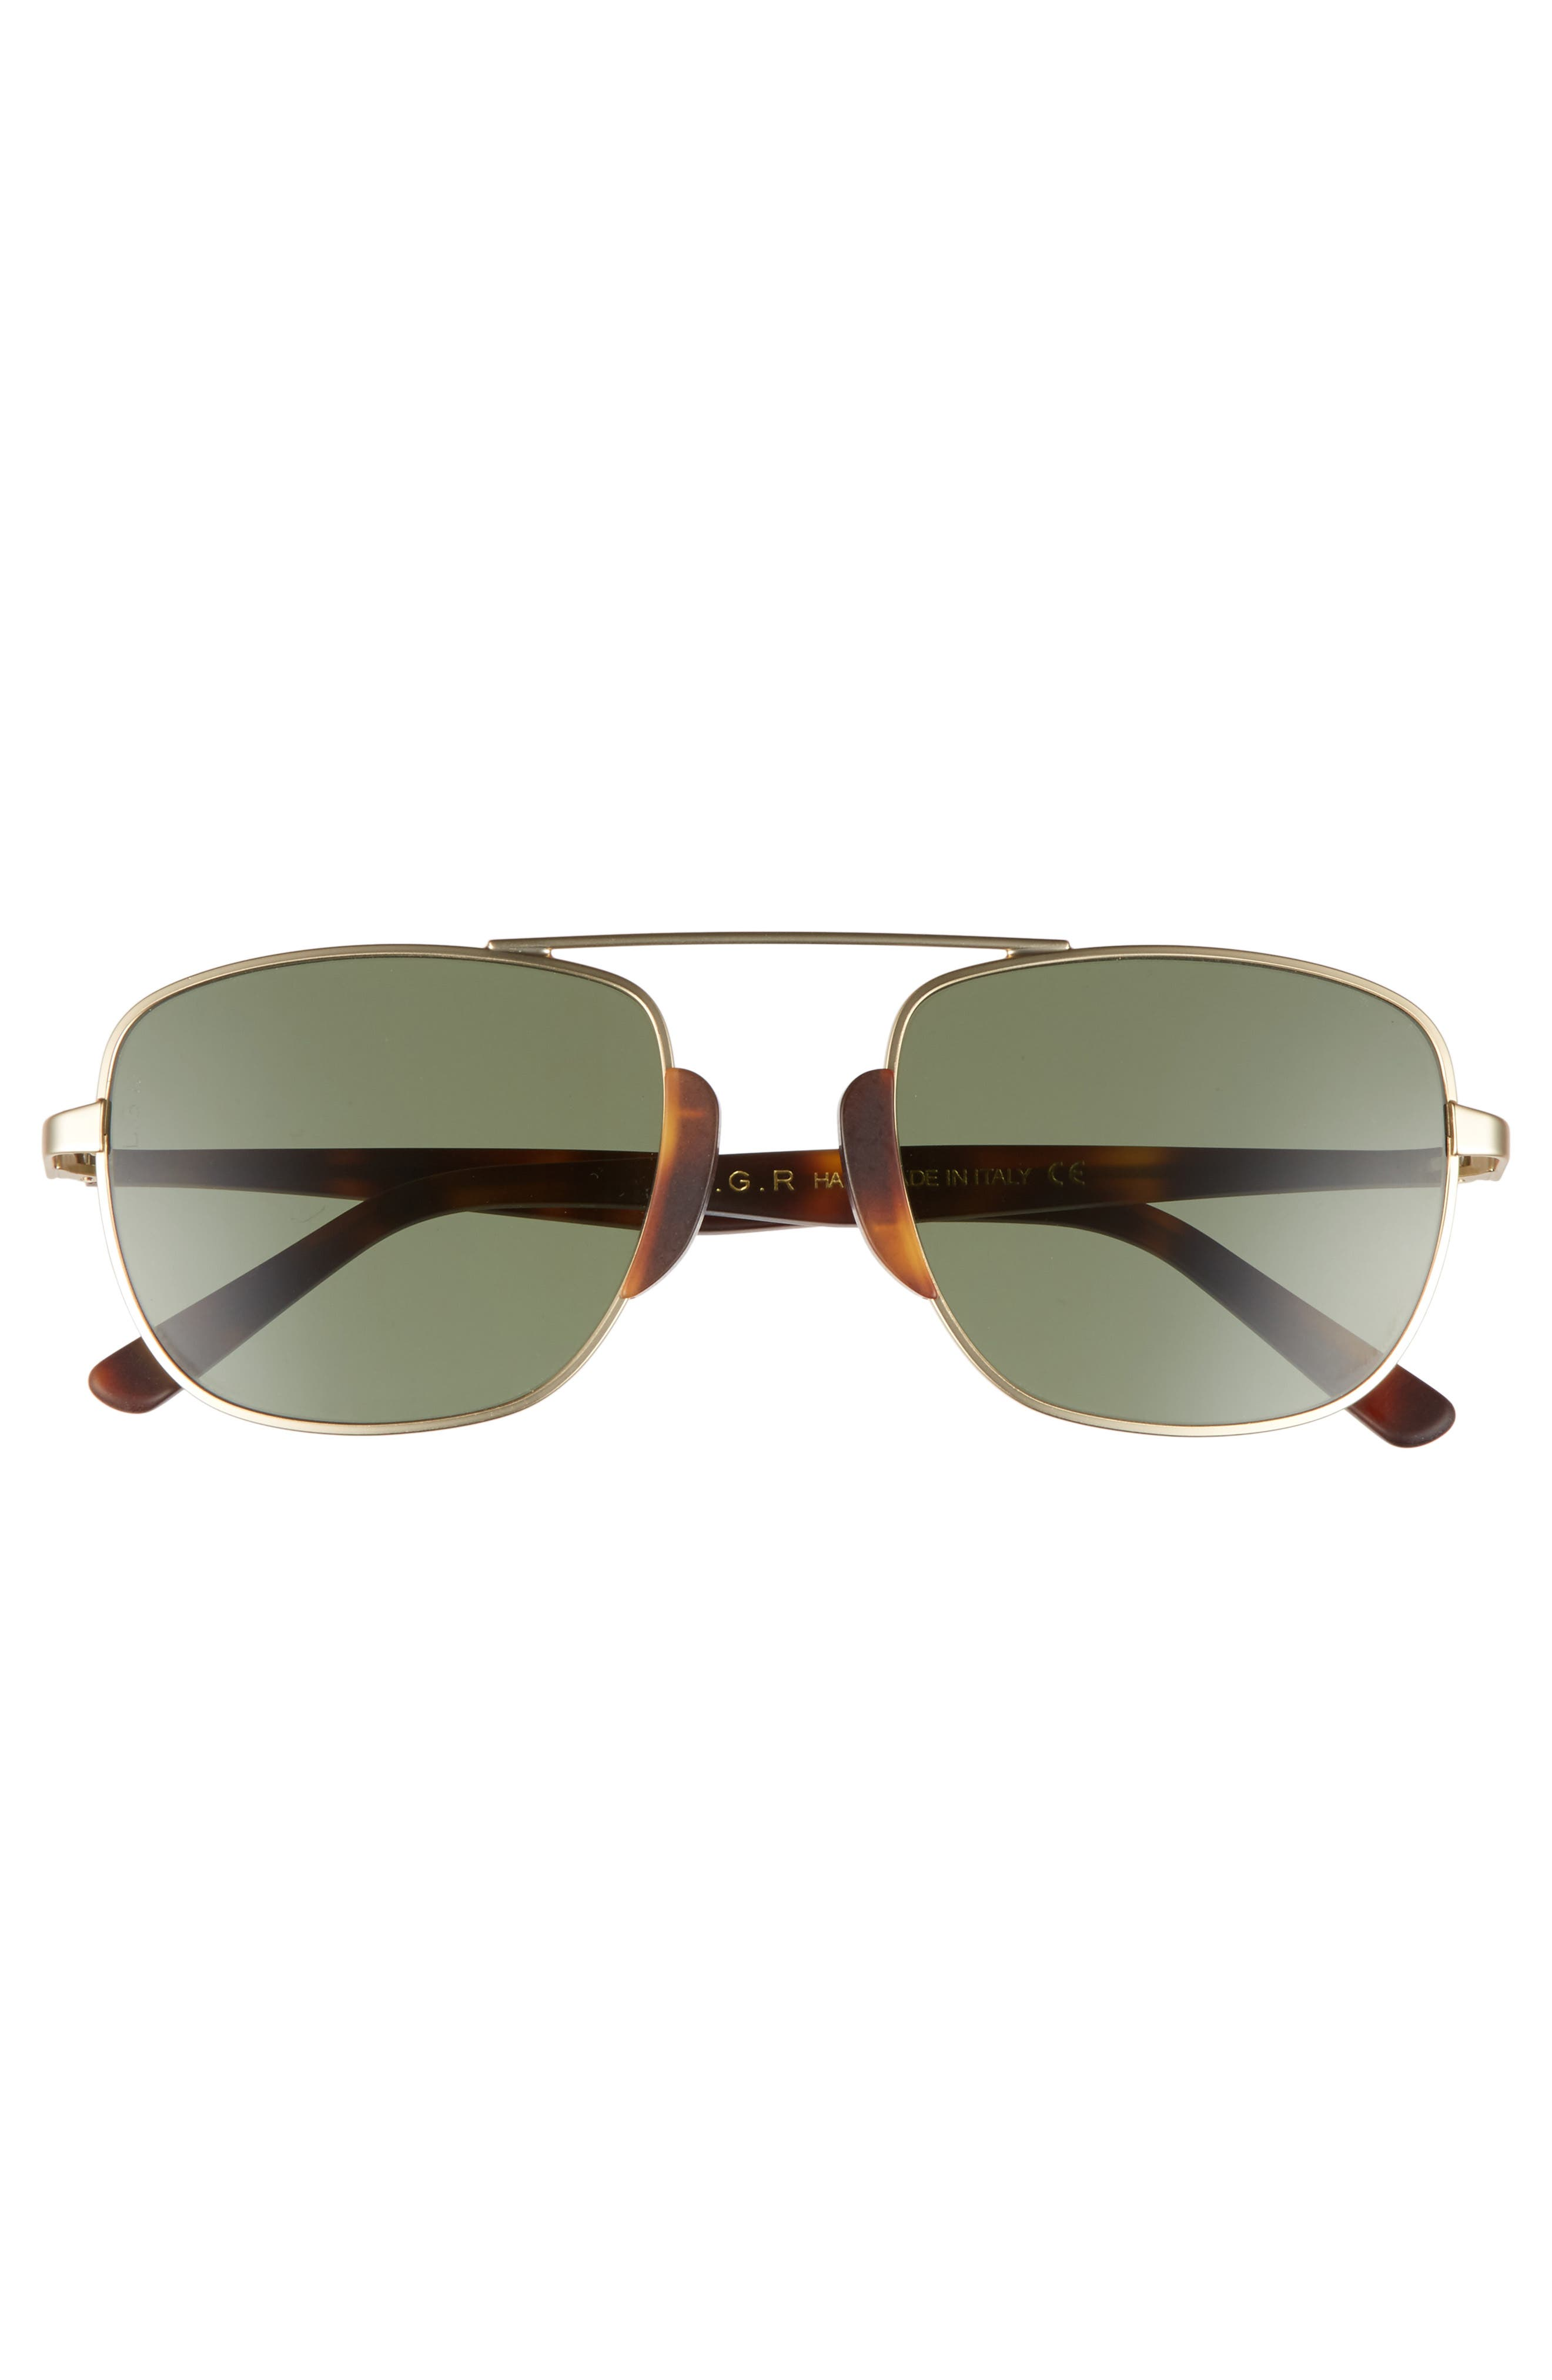 Negus 56mm Sunglasses,                             Alternate thumbnail 2, color,                             Gold Matte/ Brown/ Green